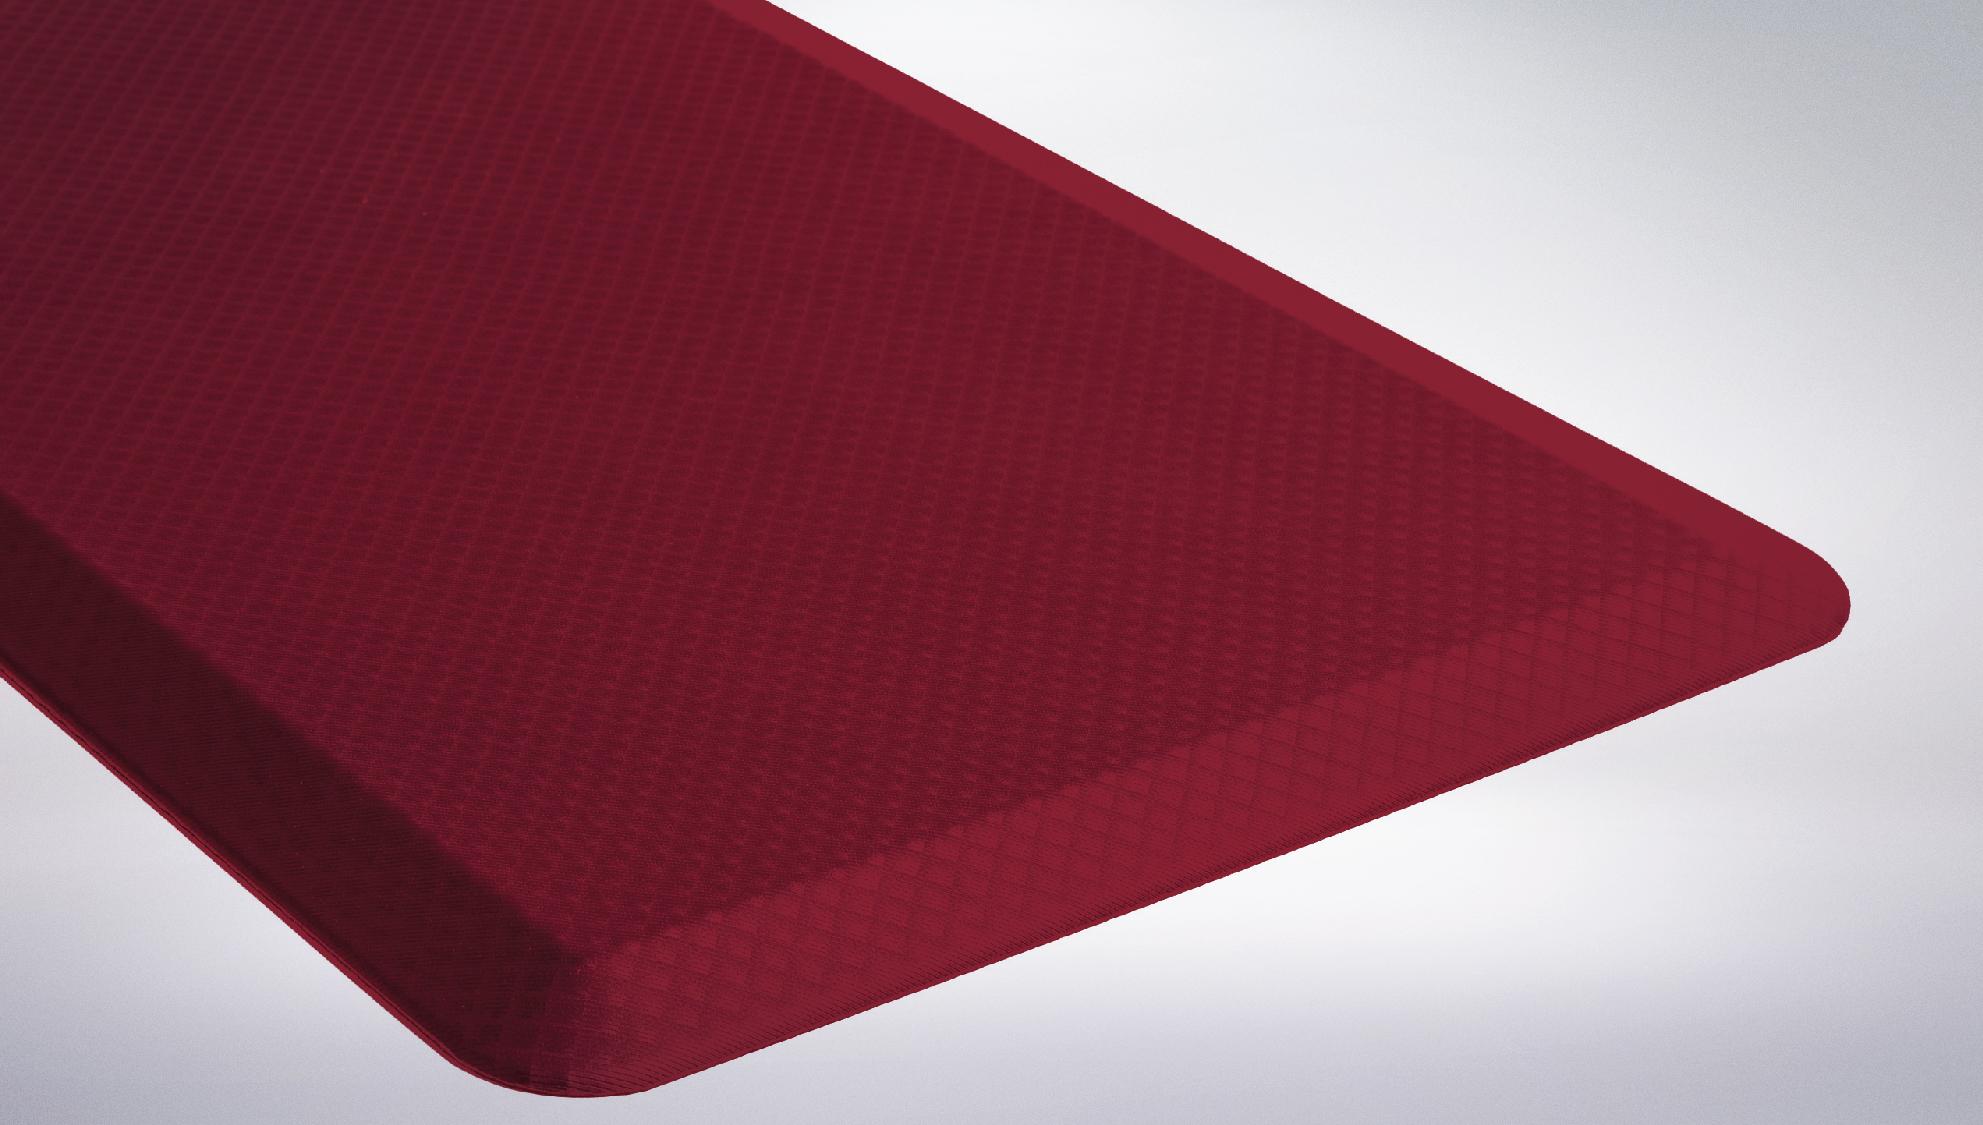 Non Slip Anti Fatigue Floor Mats : The original kangaroo tm non slip anti fatigue comfort